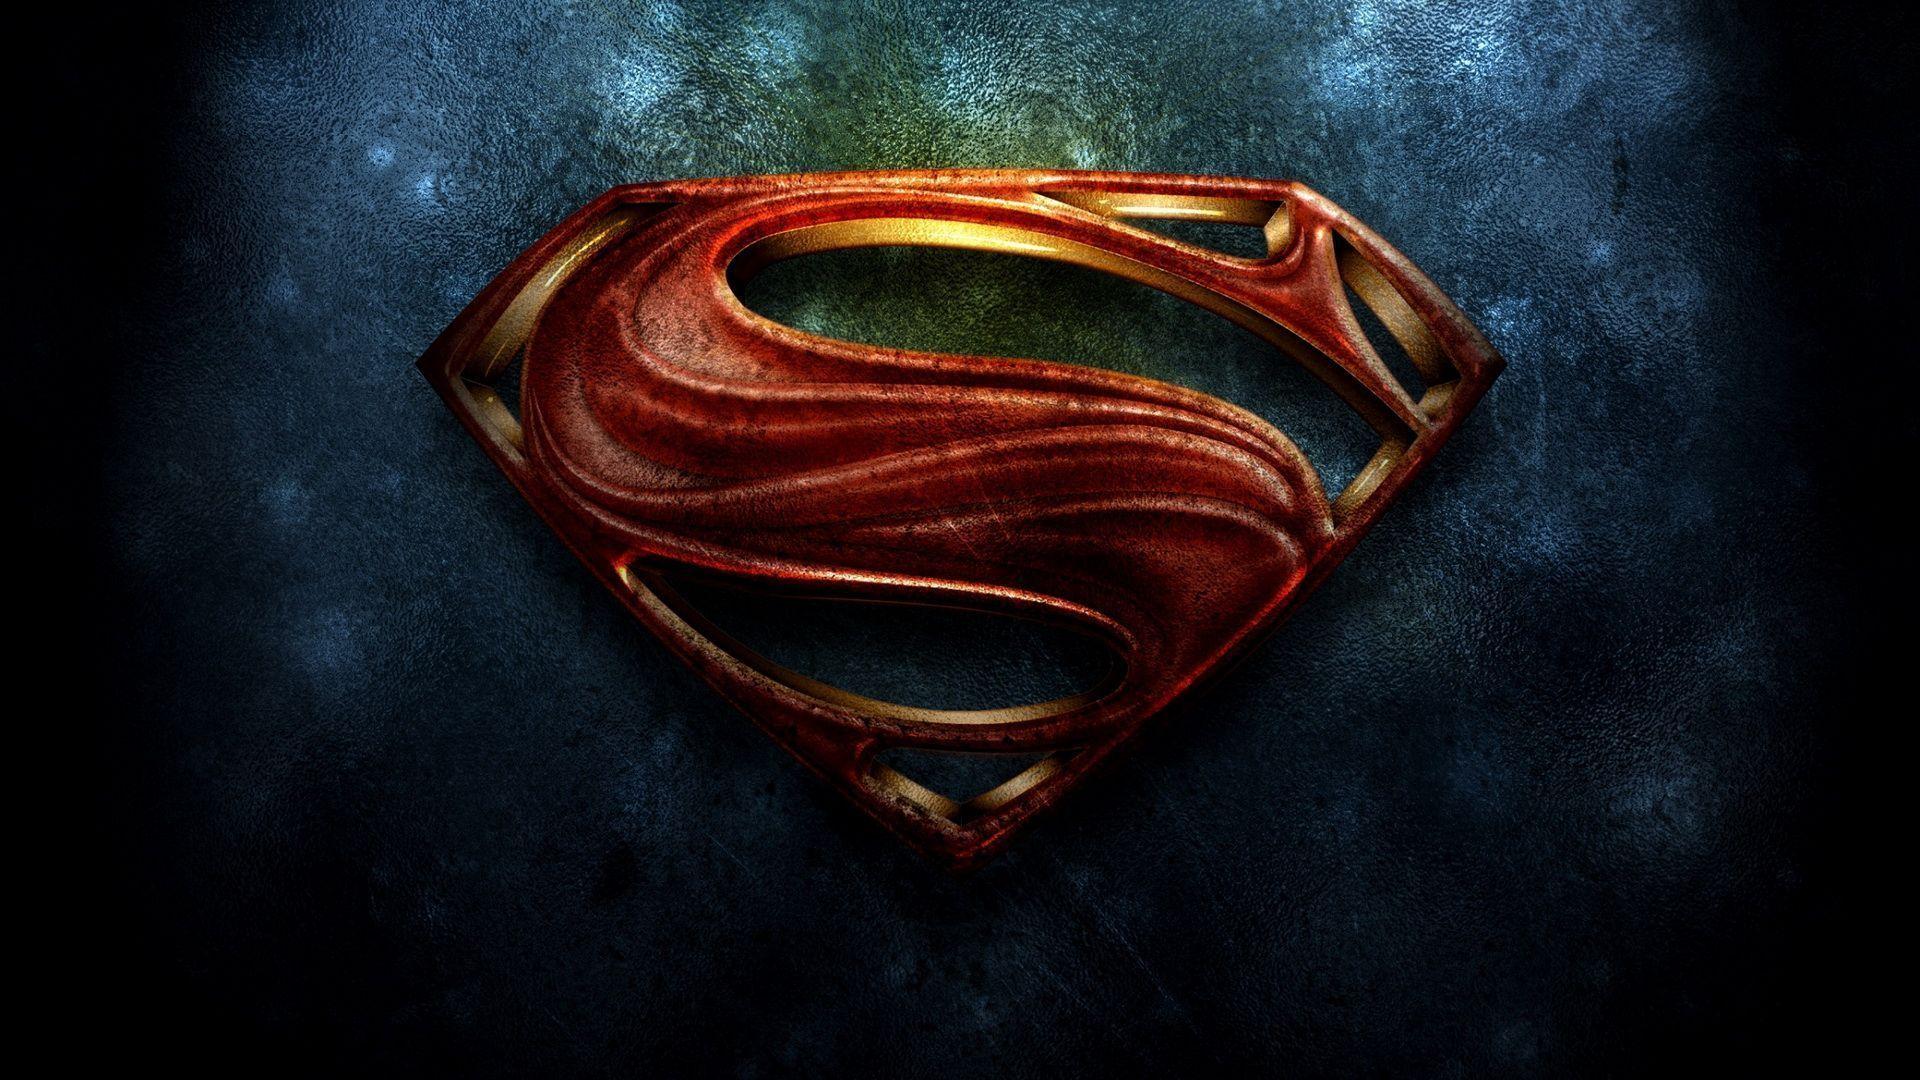 superman wallpapers wallpaper 1600×900 superman image wallpapers